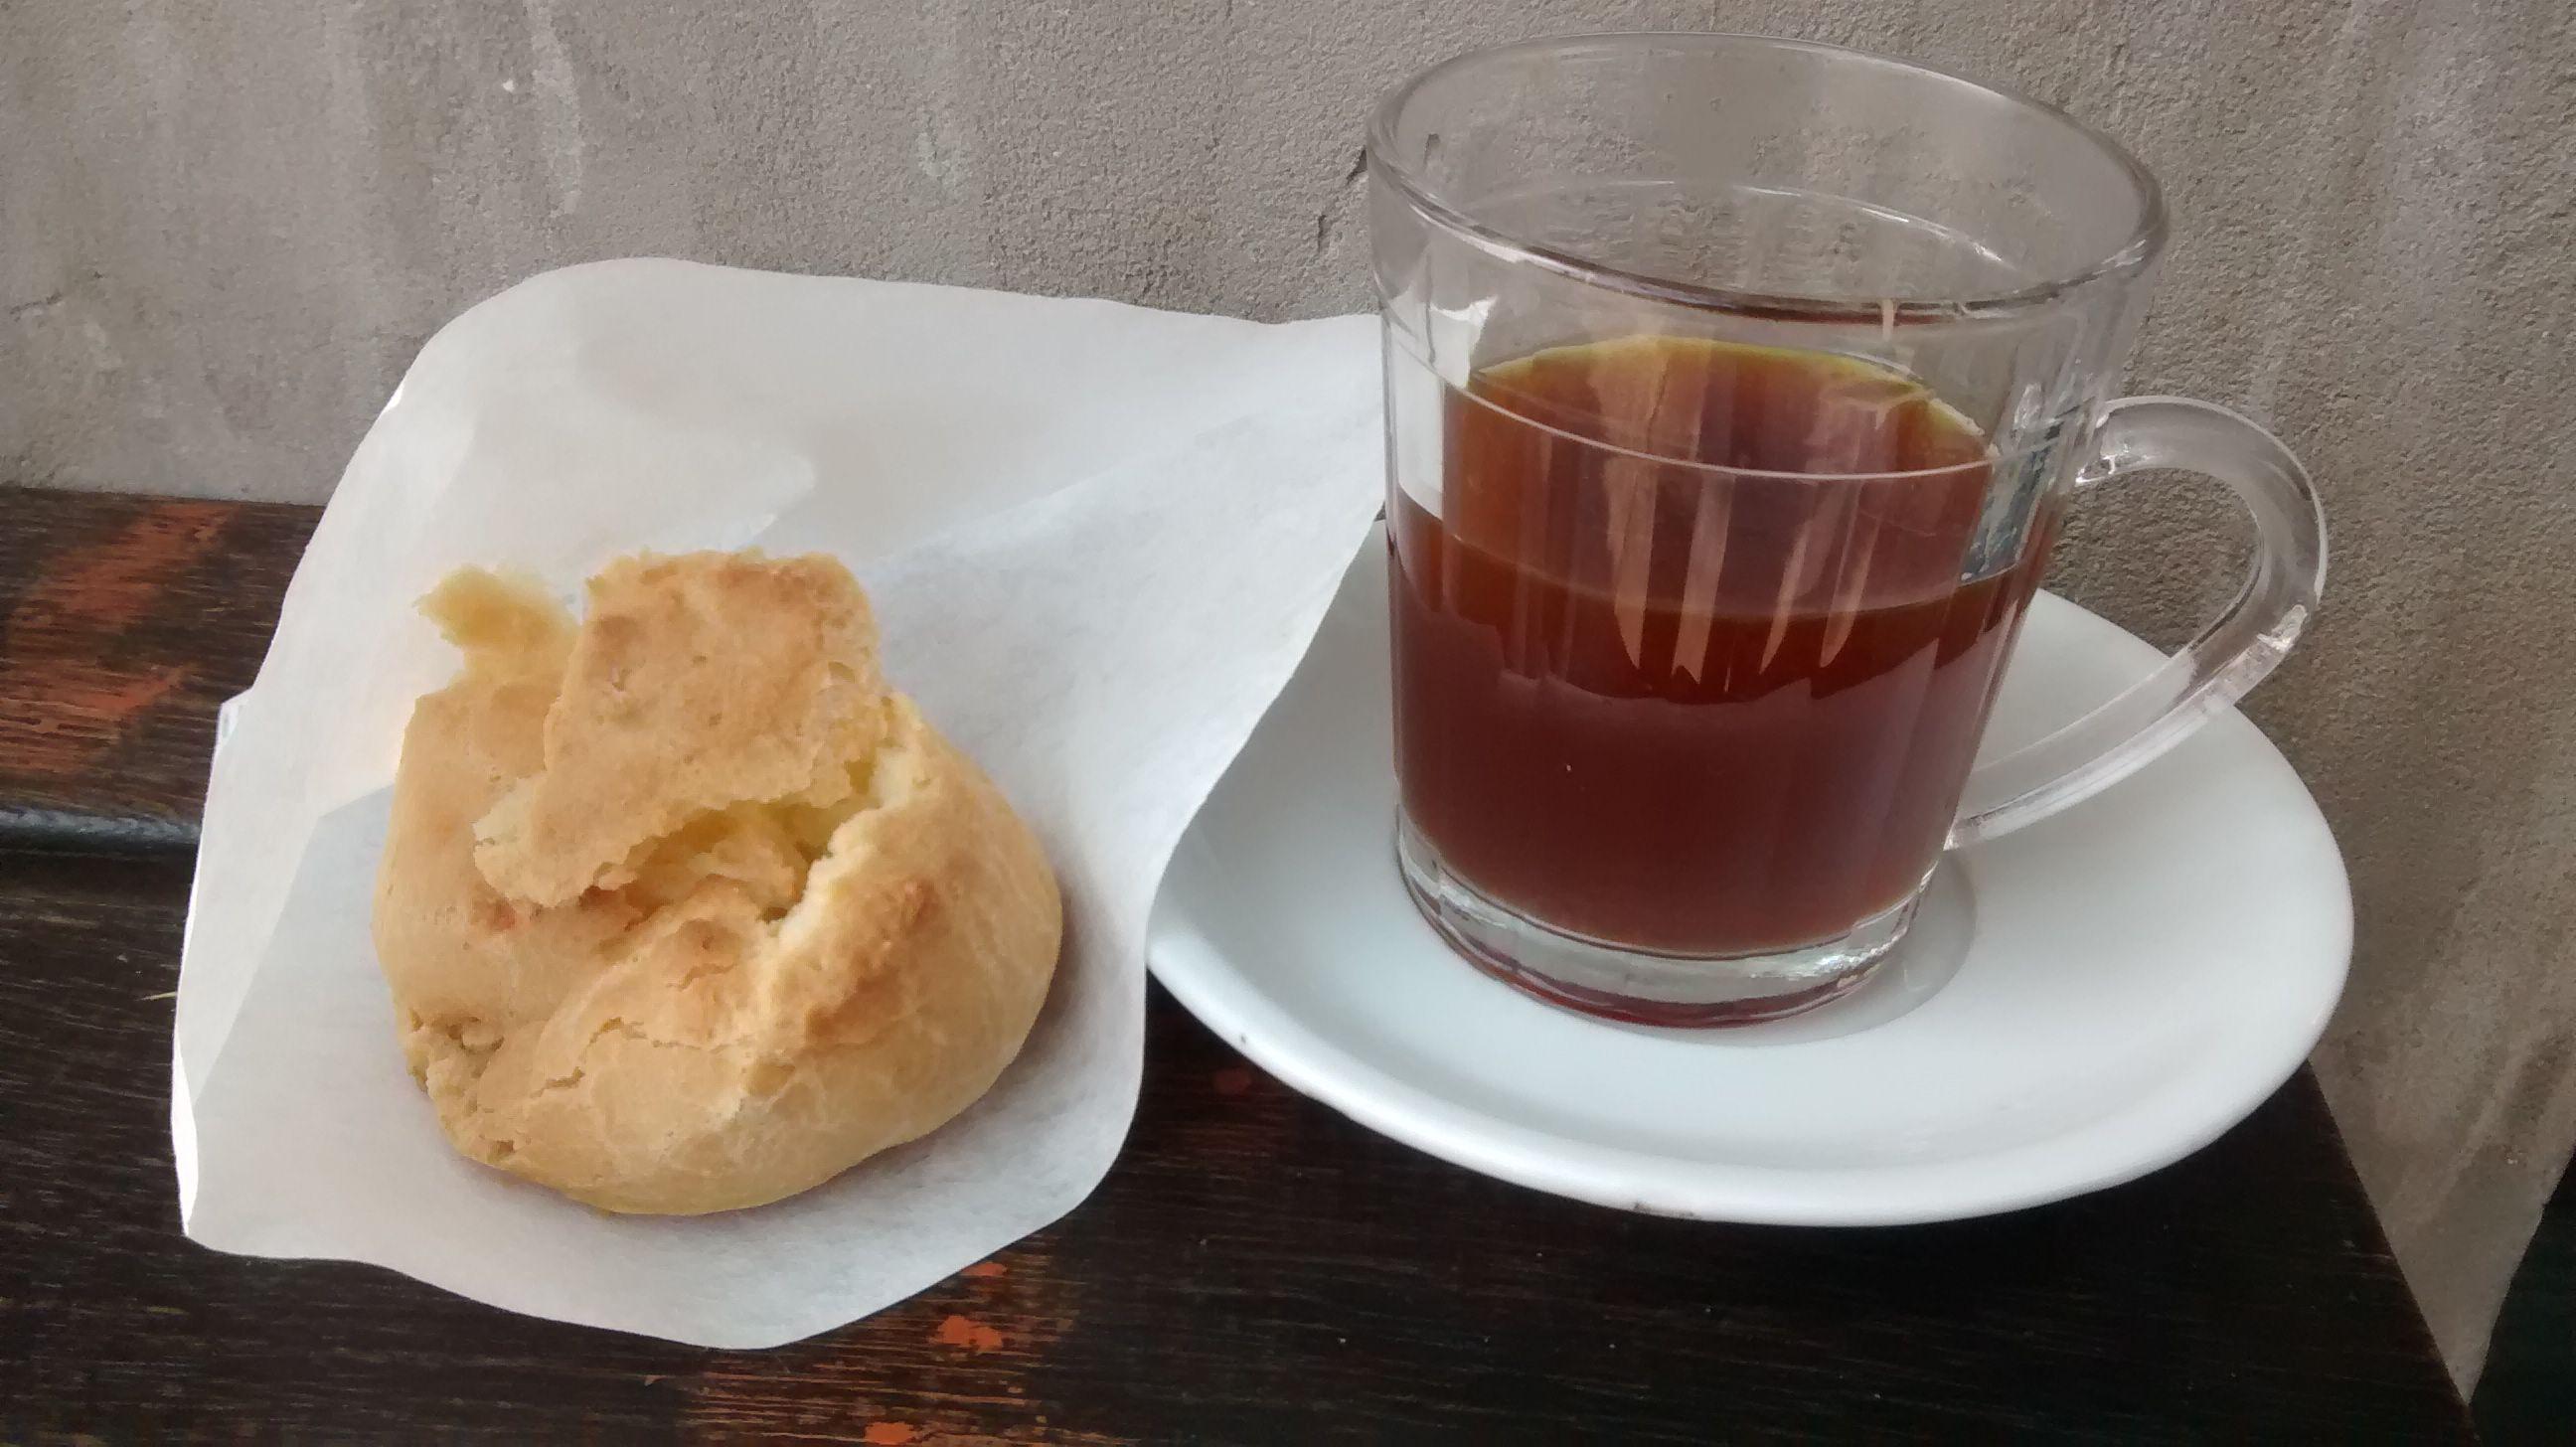 Café na Aeropress - Clemente Café